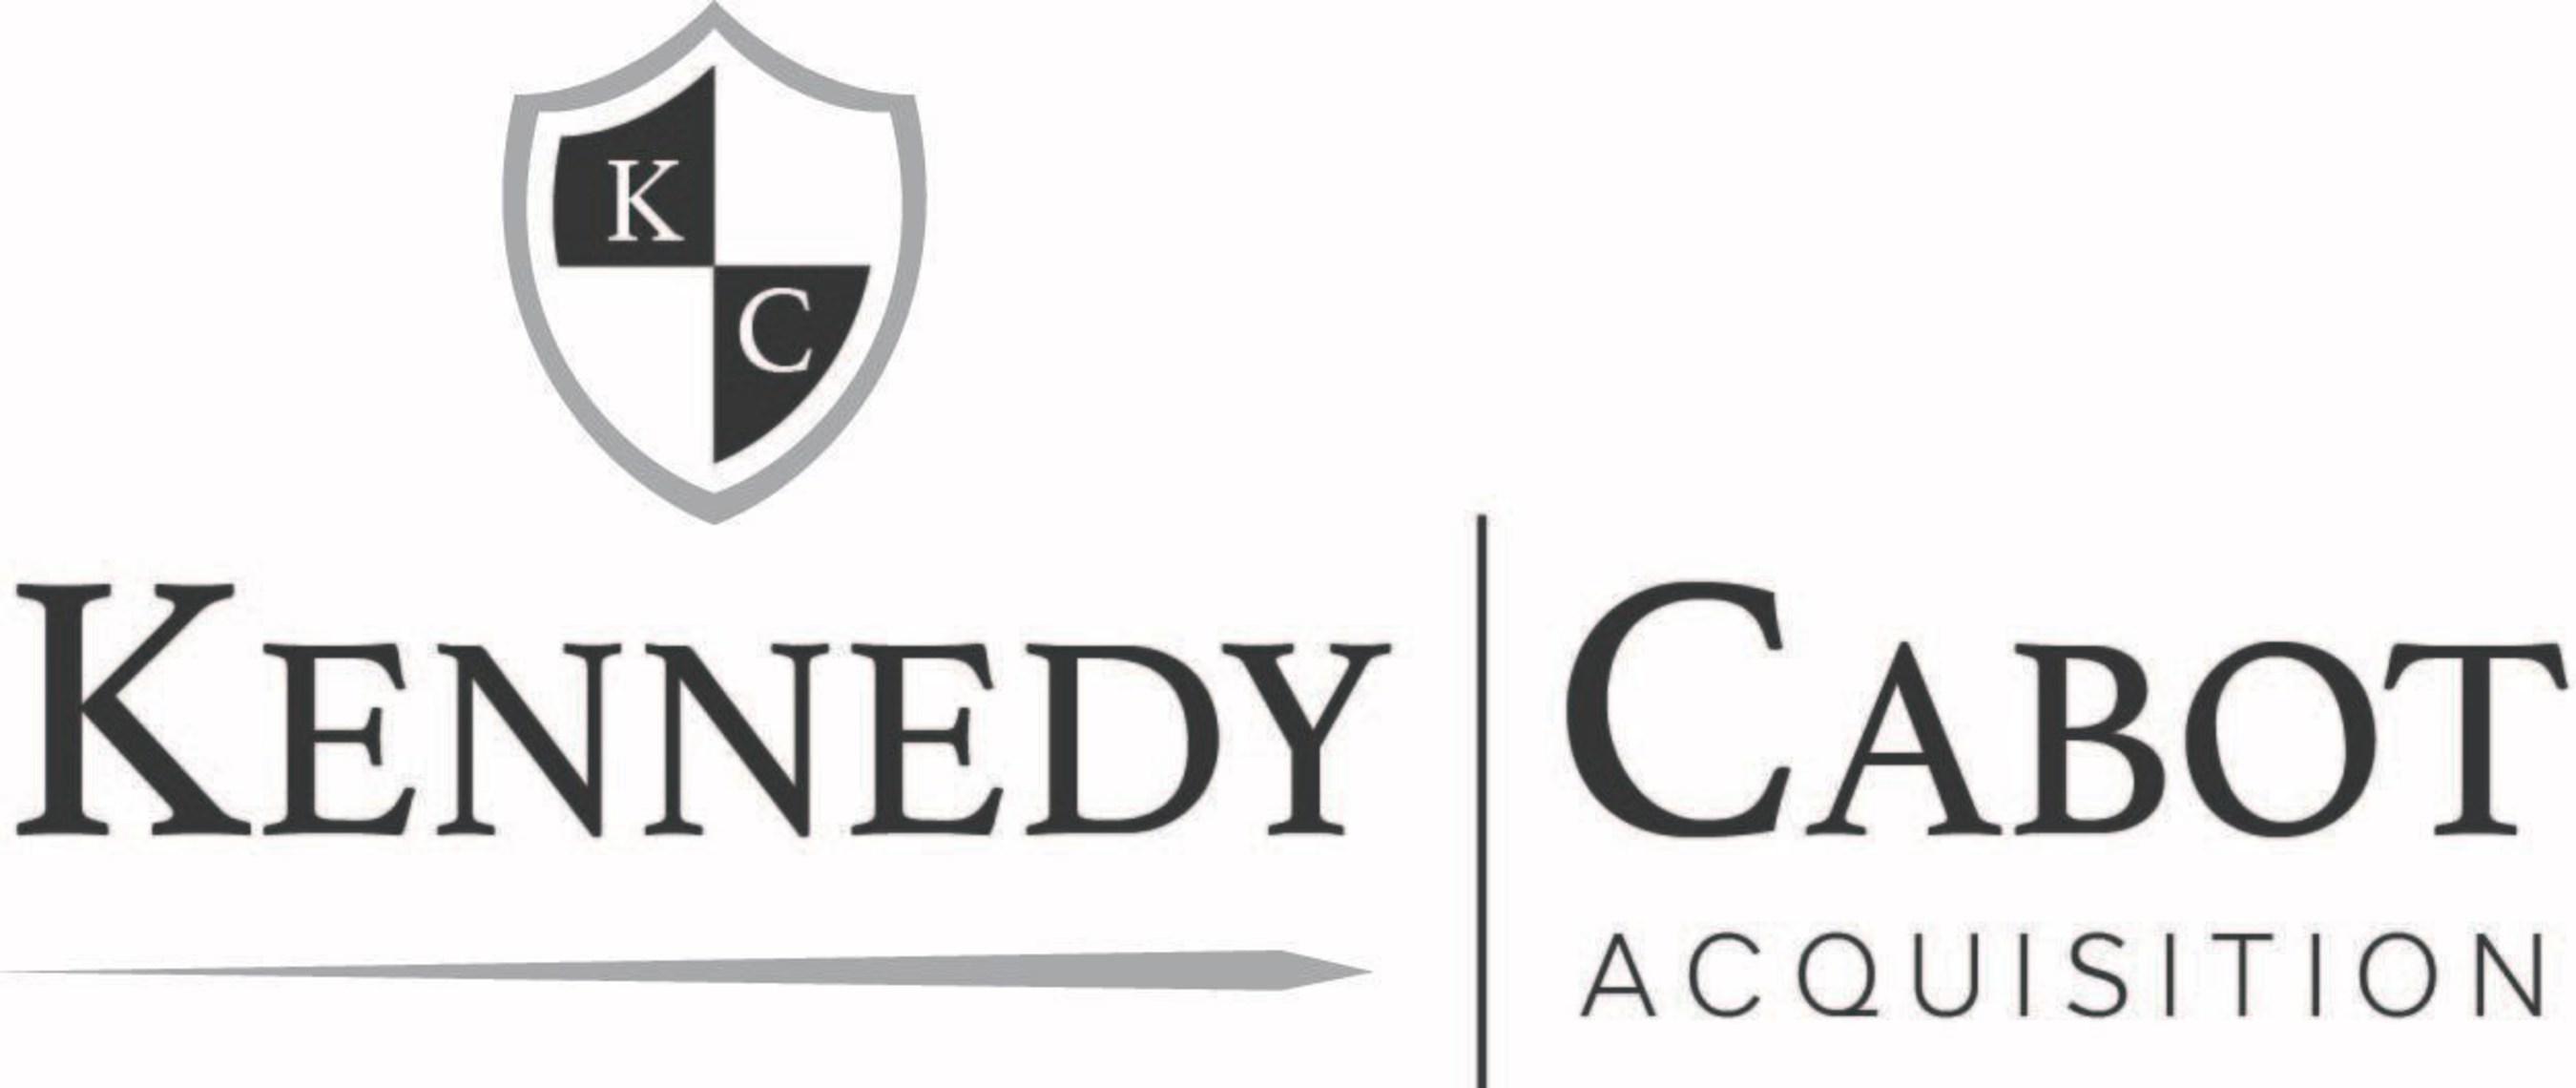 Kennedy Cabot Acquisition, LLC Announces Amendment and